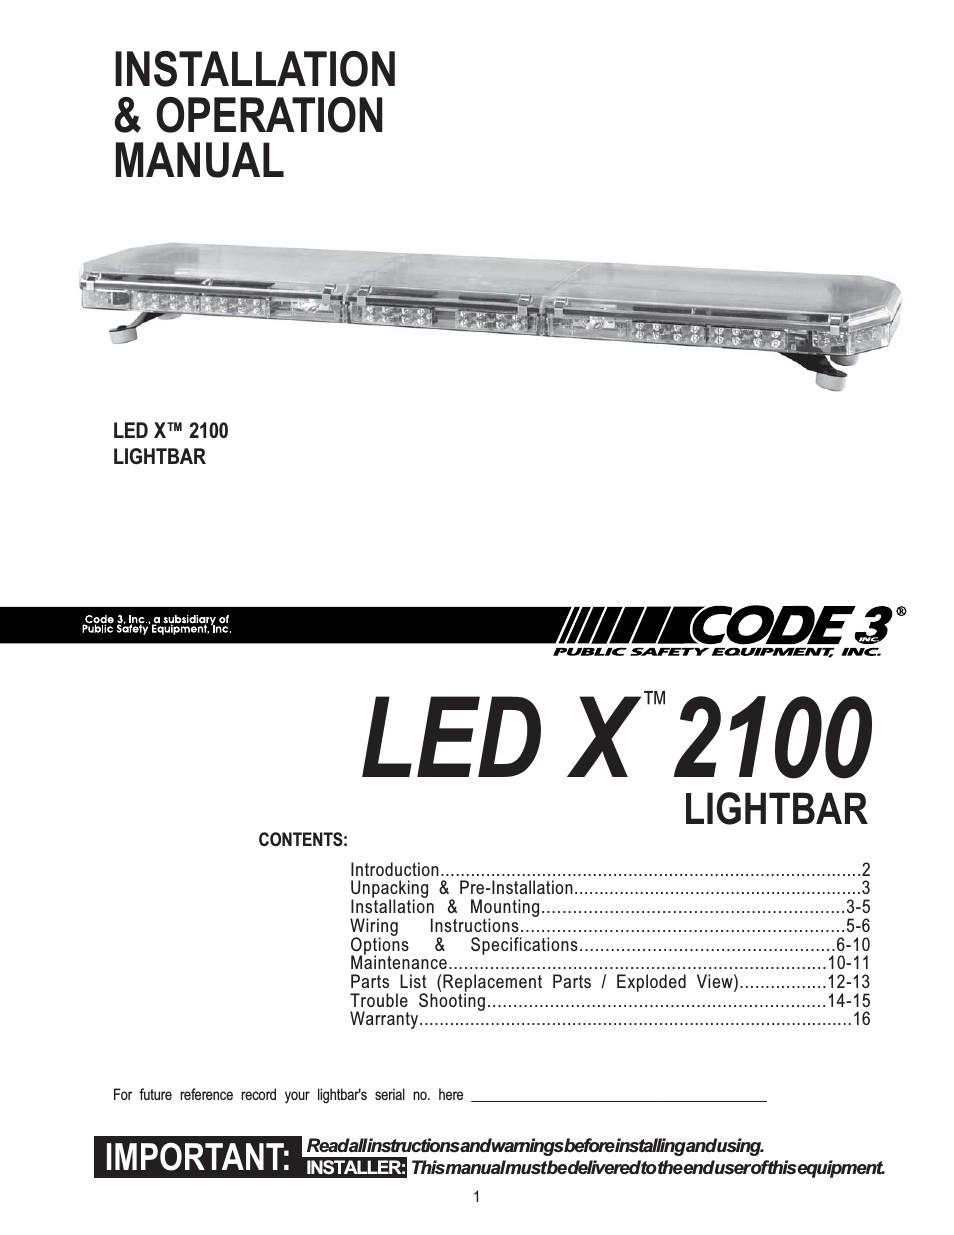 Code 3 Light Bar Wiring Diagram Archive Of Automotive A Rain Mx7000 Opinions About U2022 Rh Voterid Co 360 Led X 2100 Lightbar